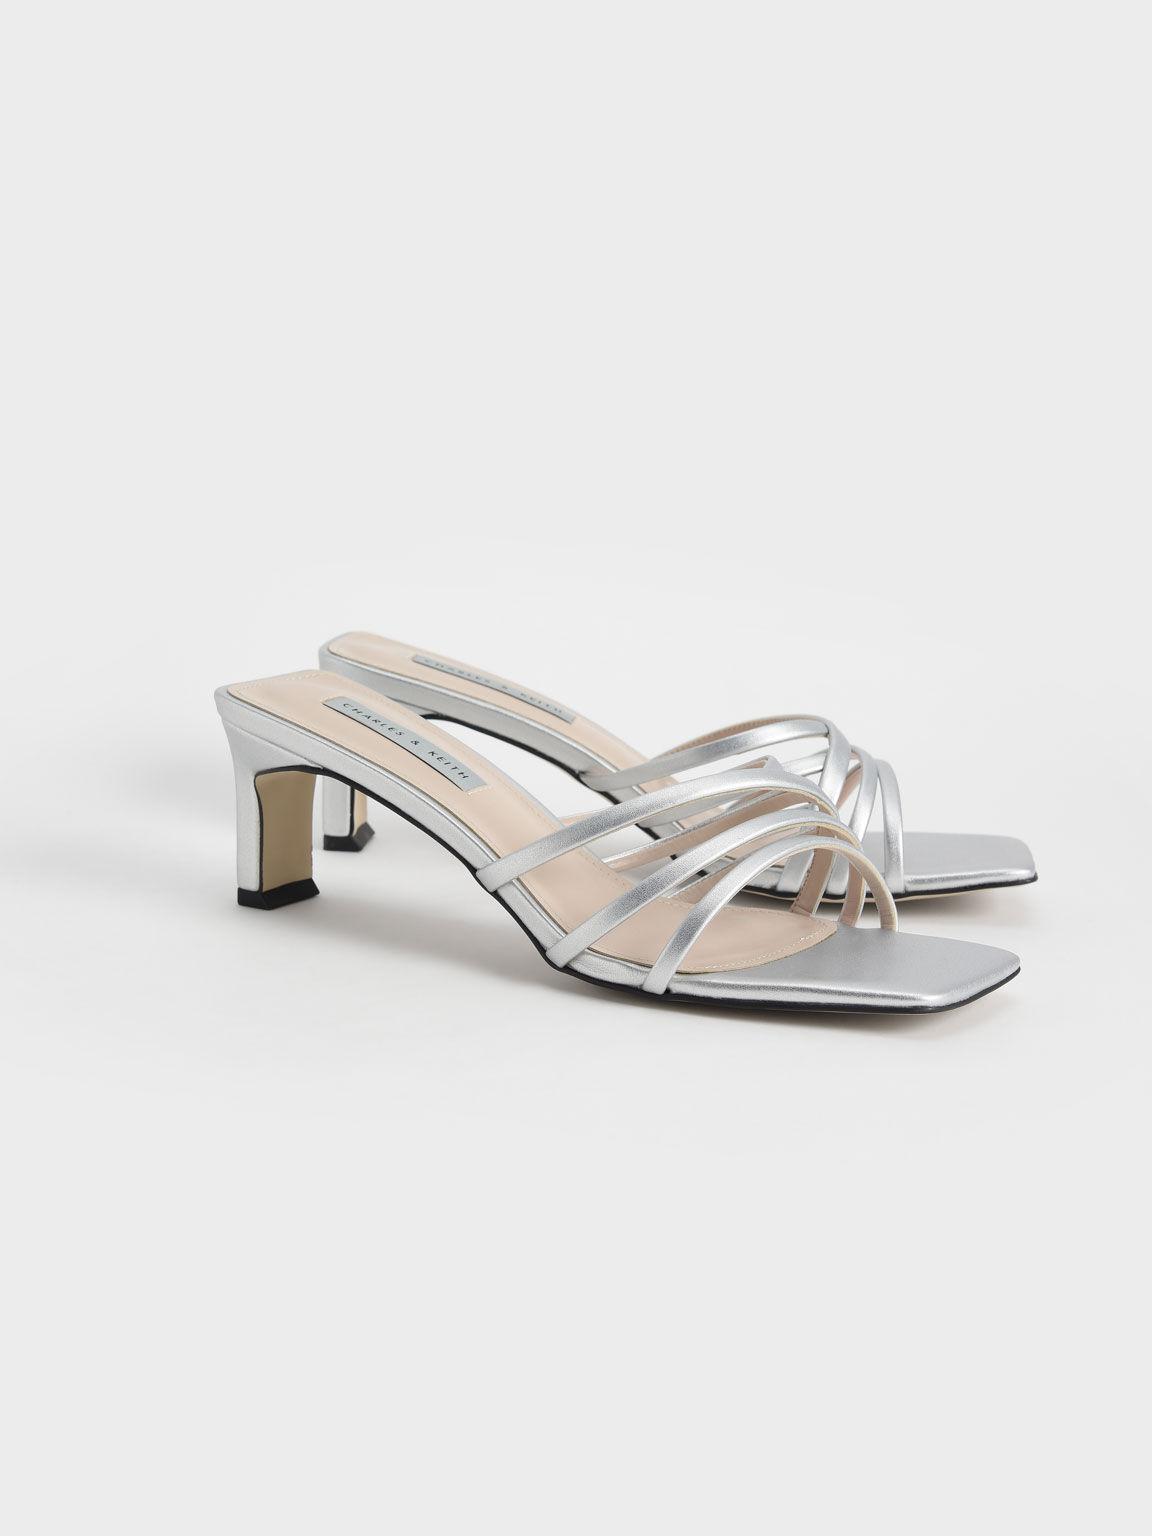 Asymmetric Strappy Sandals, Silver, hi-res